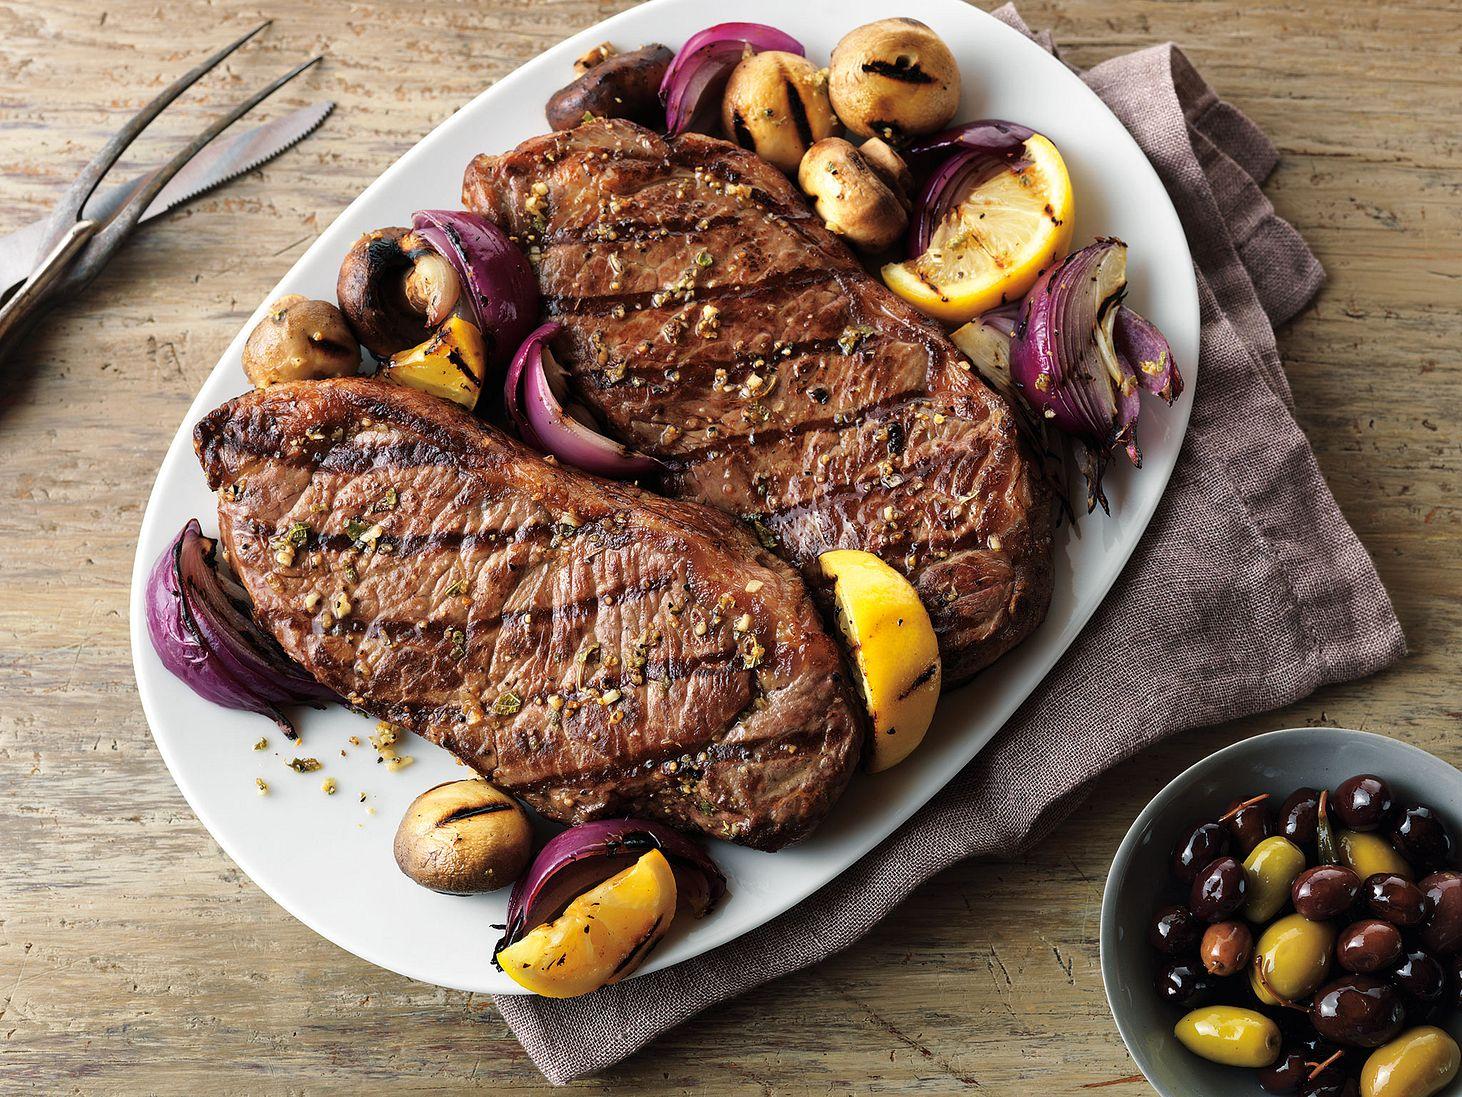 grecian-beef-top-loin-steaks-and-mushroom-kabobs.eps